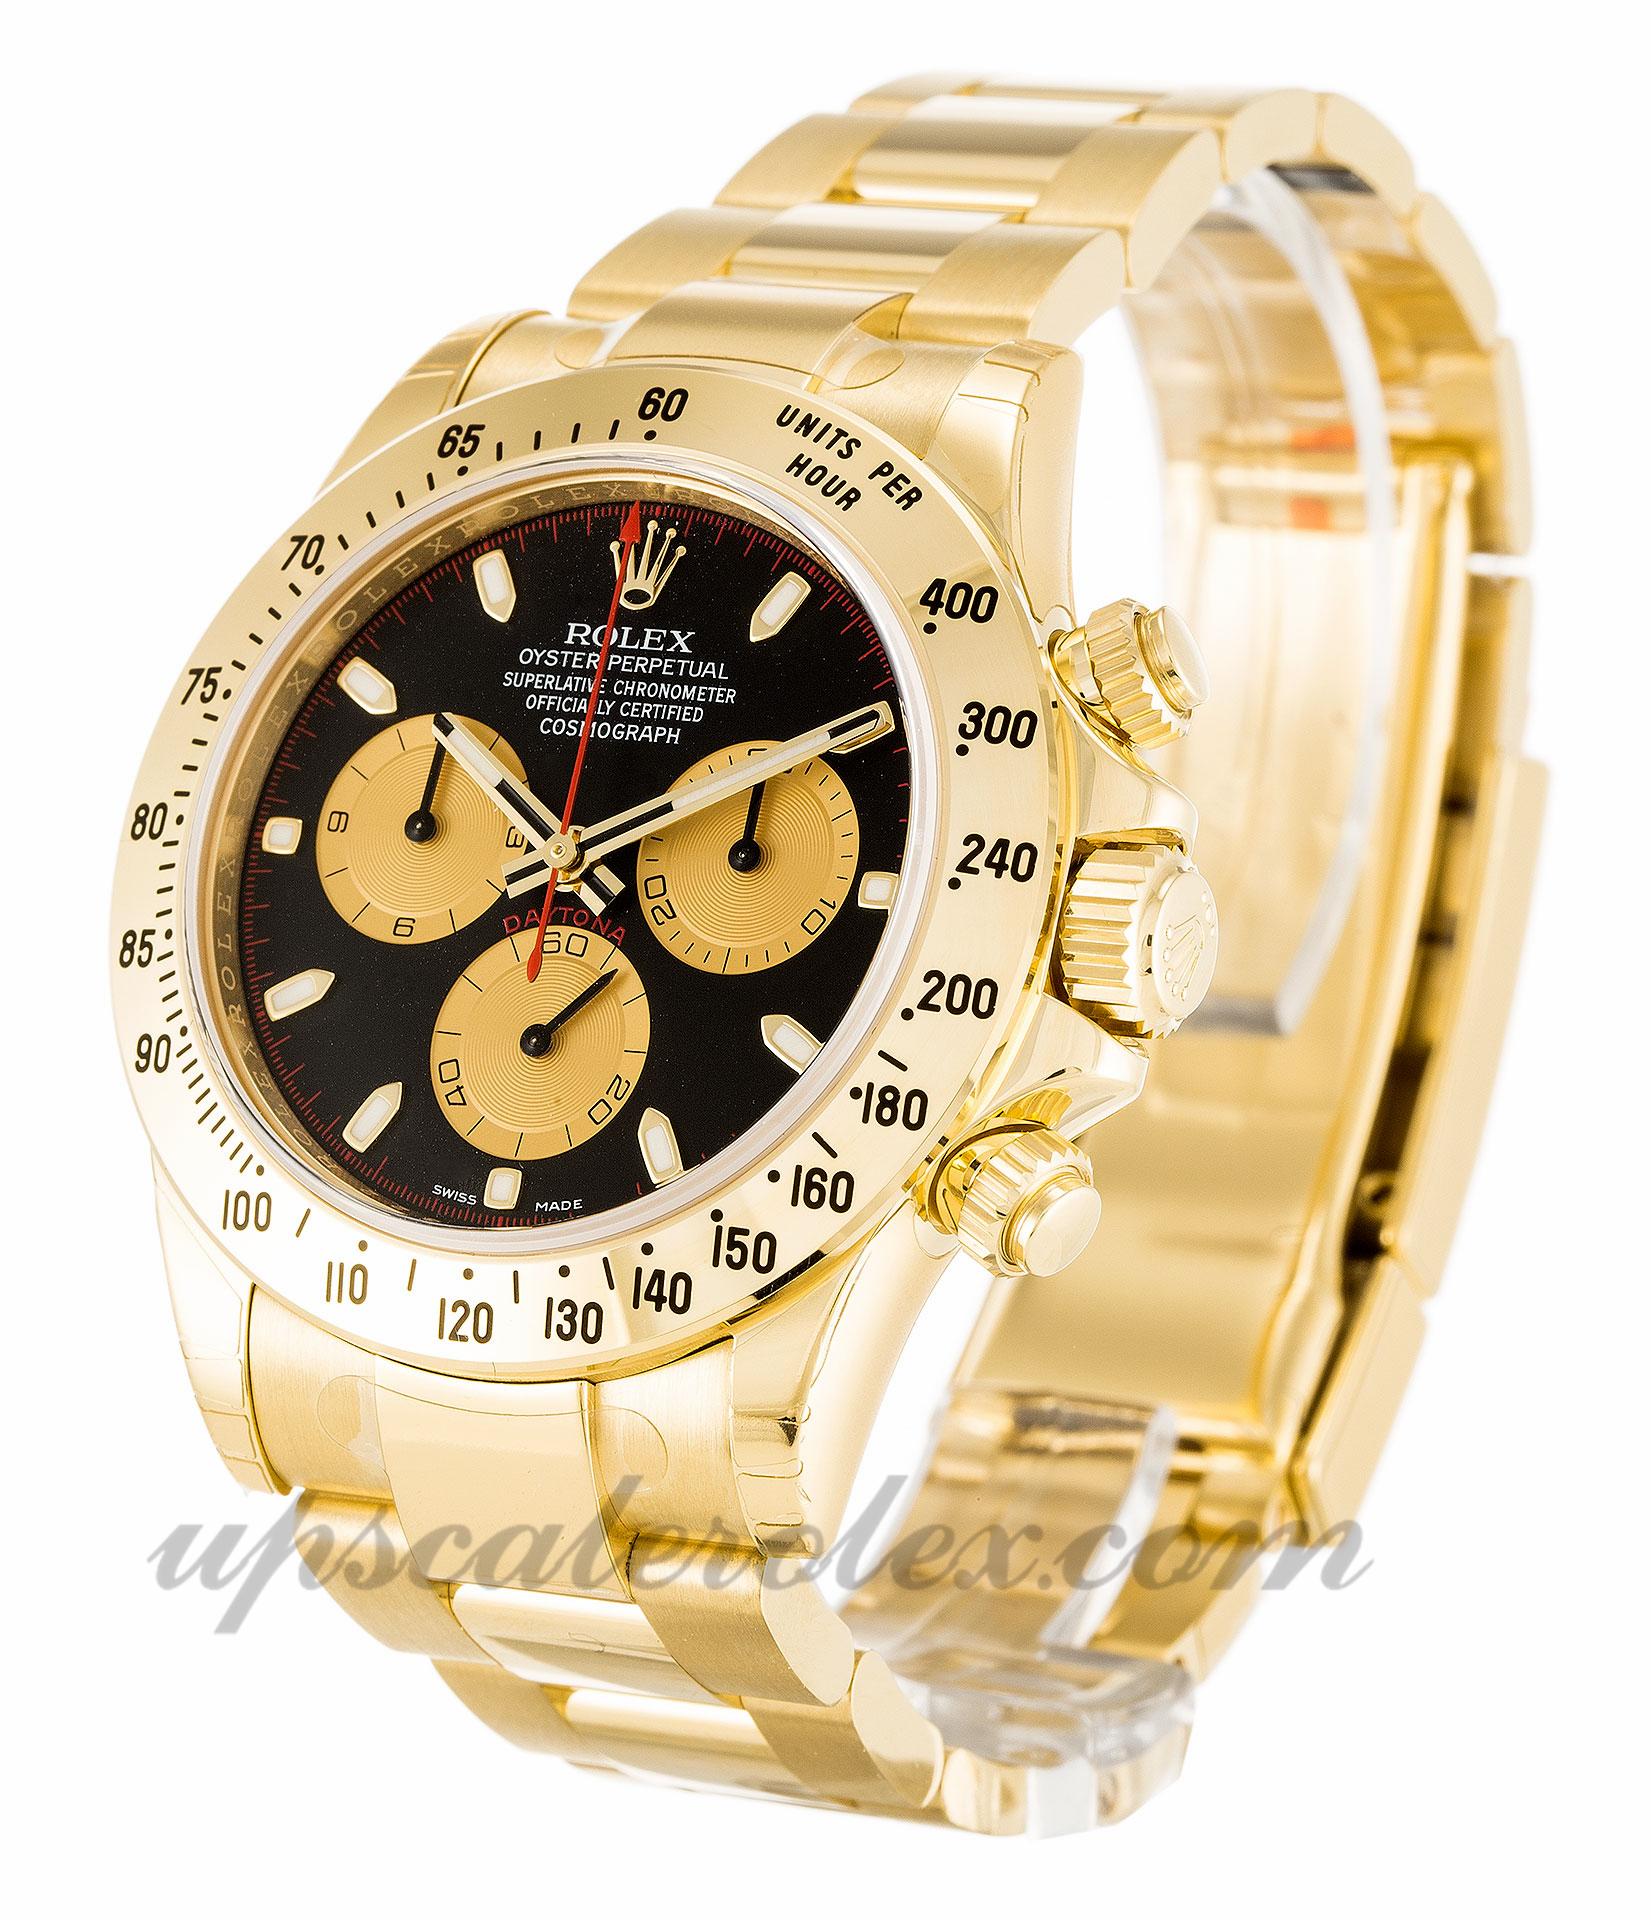 Rolex Replicas For Sale Amazon For Mens Rolex Daytona 116528 Watch